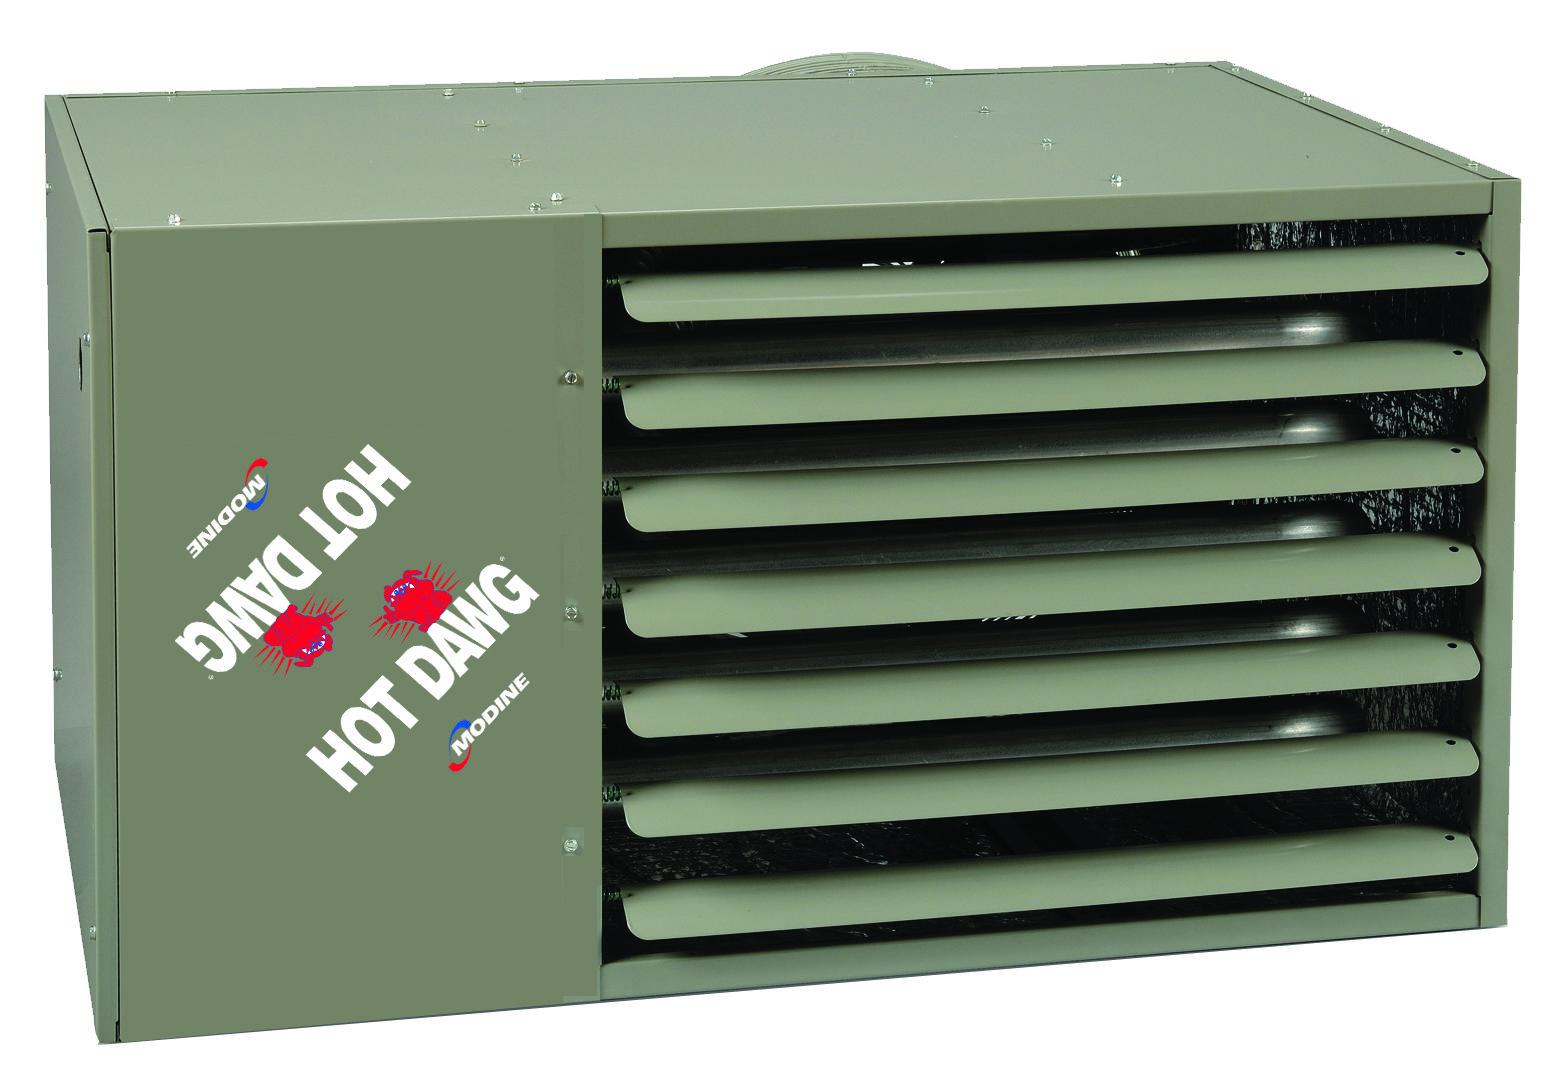 HDS100 New Logo Garage heater, The unit, Hot